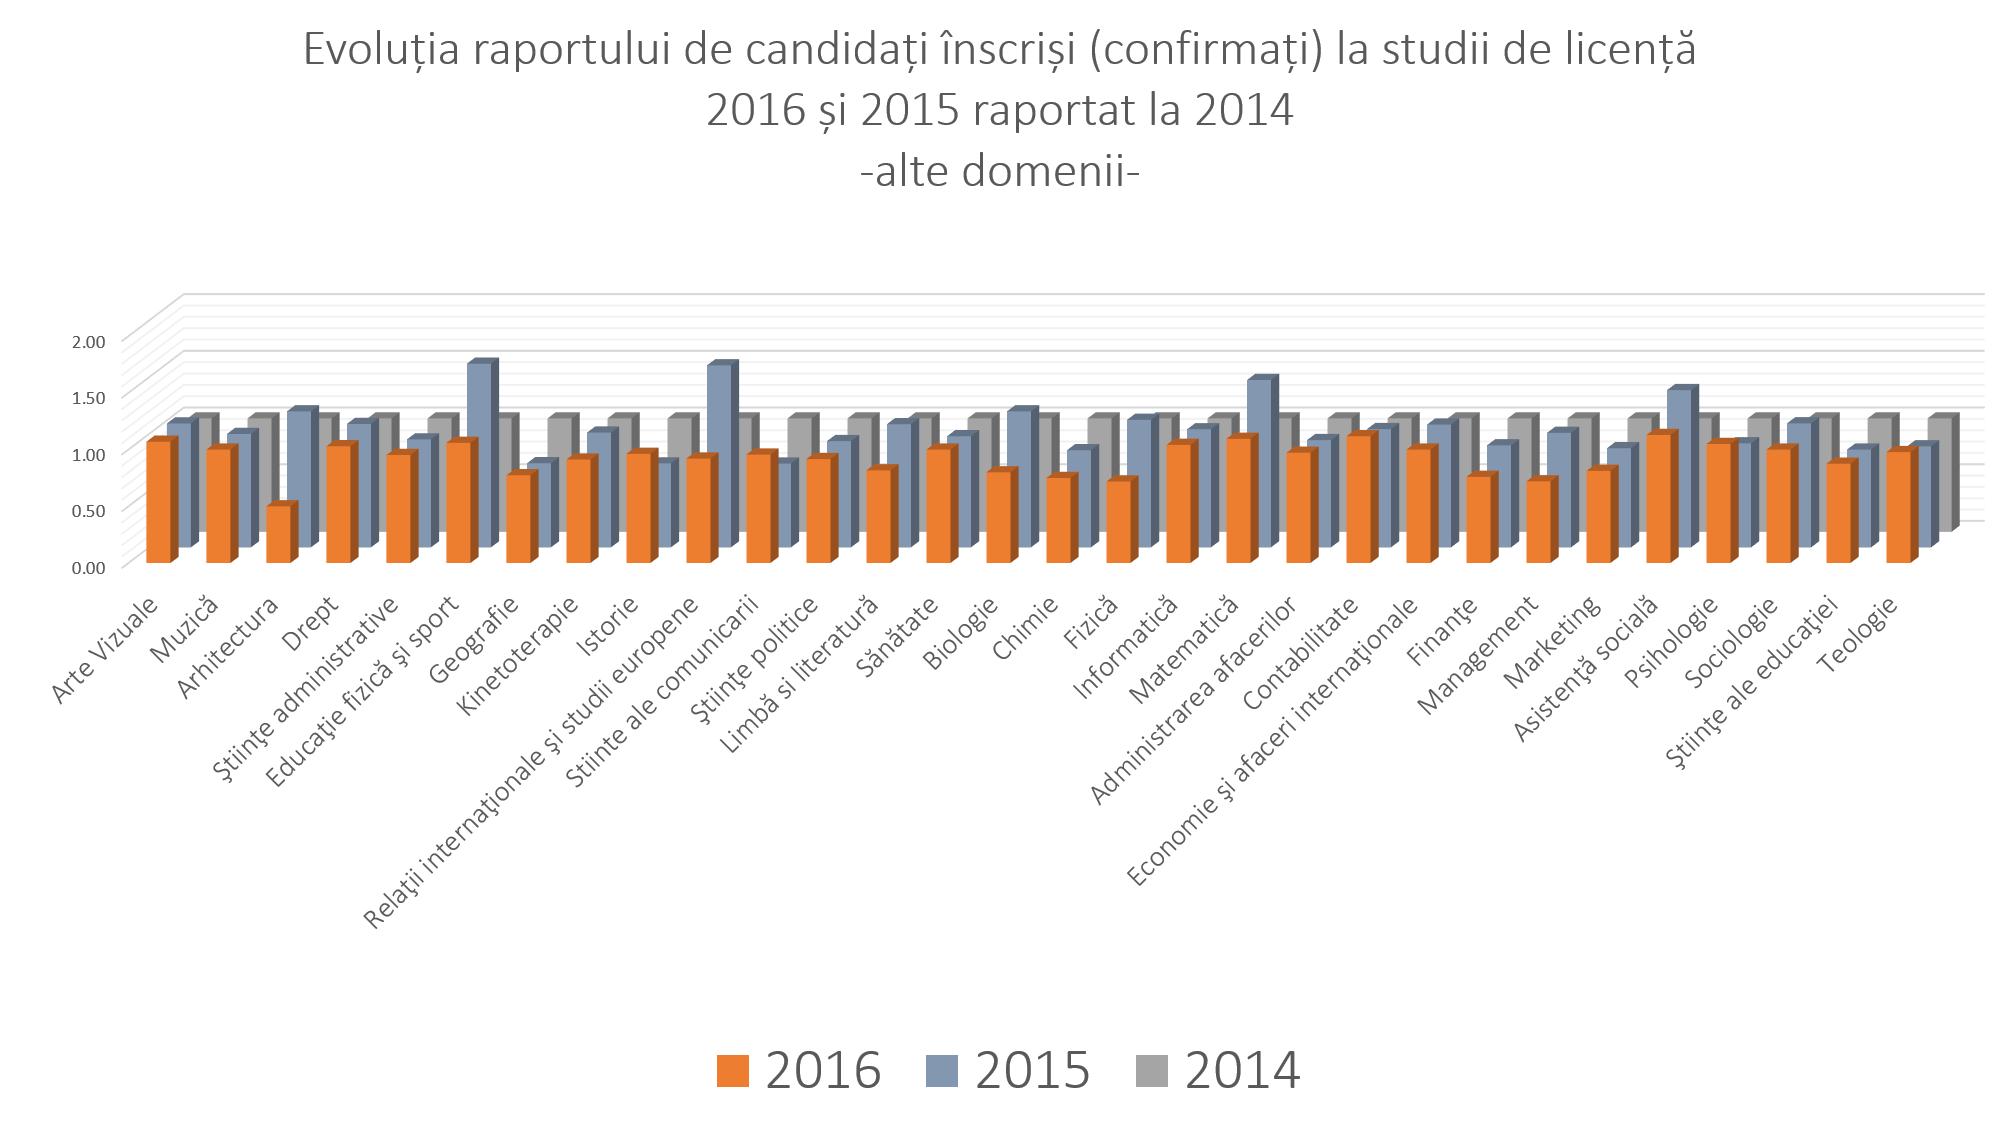 candidati-inscrisi-2014-2016-alte-domenii